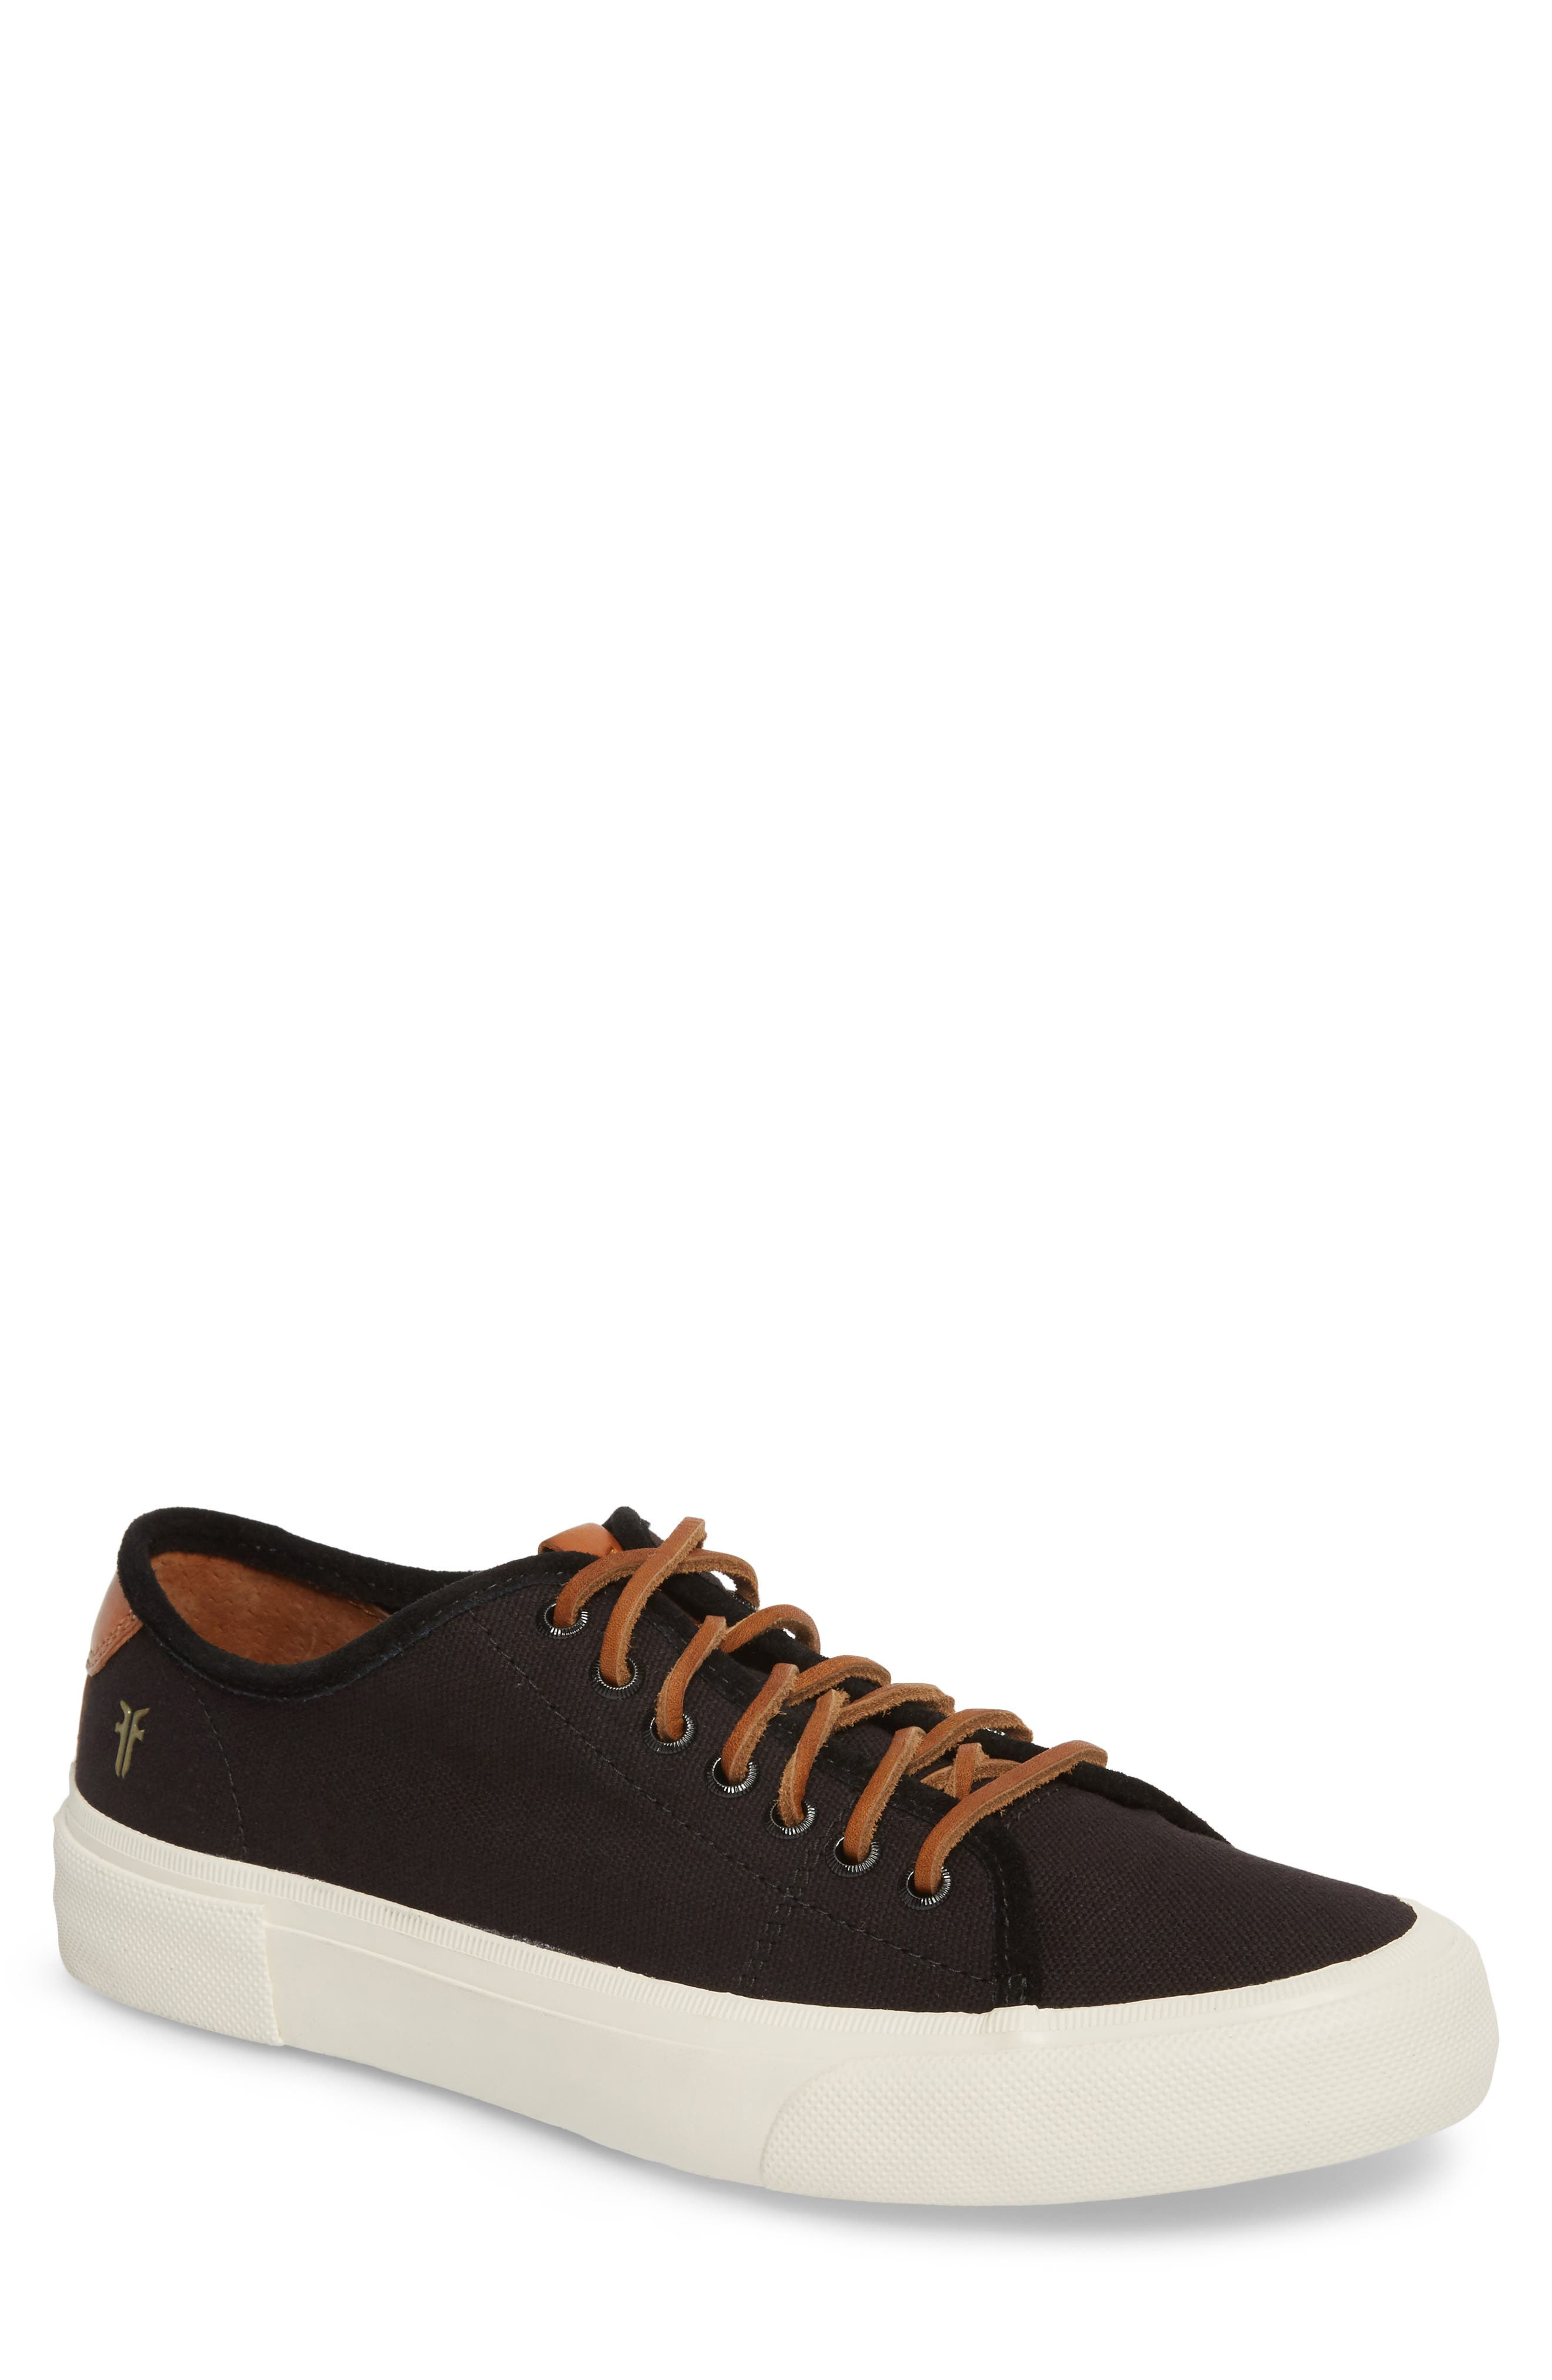 Ludlow Low Top Sneaker,                         Main,                         color, 001